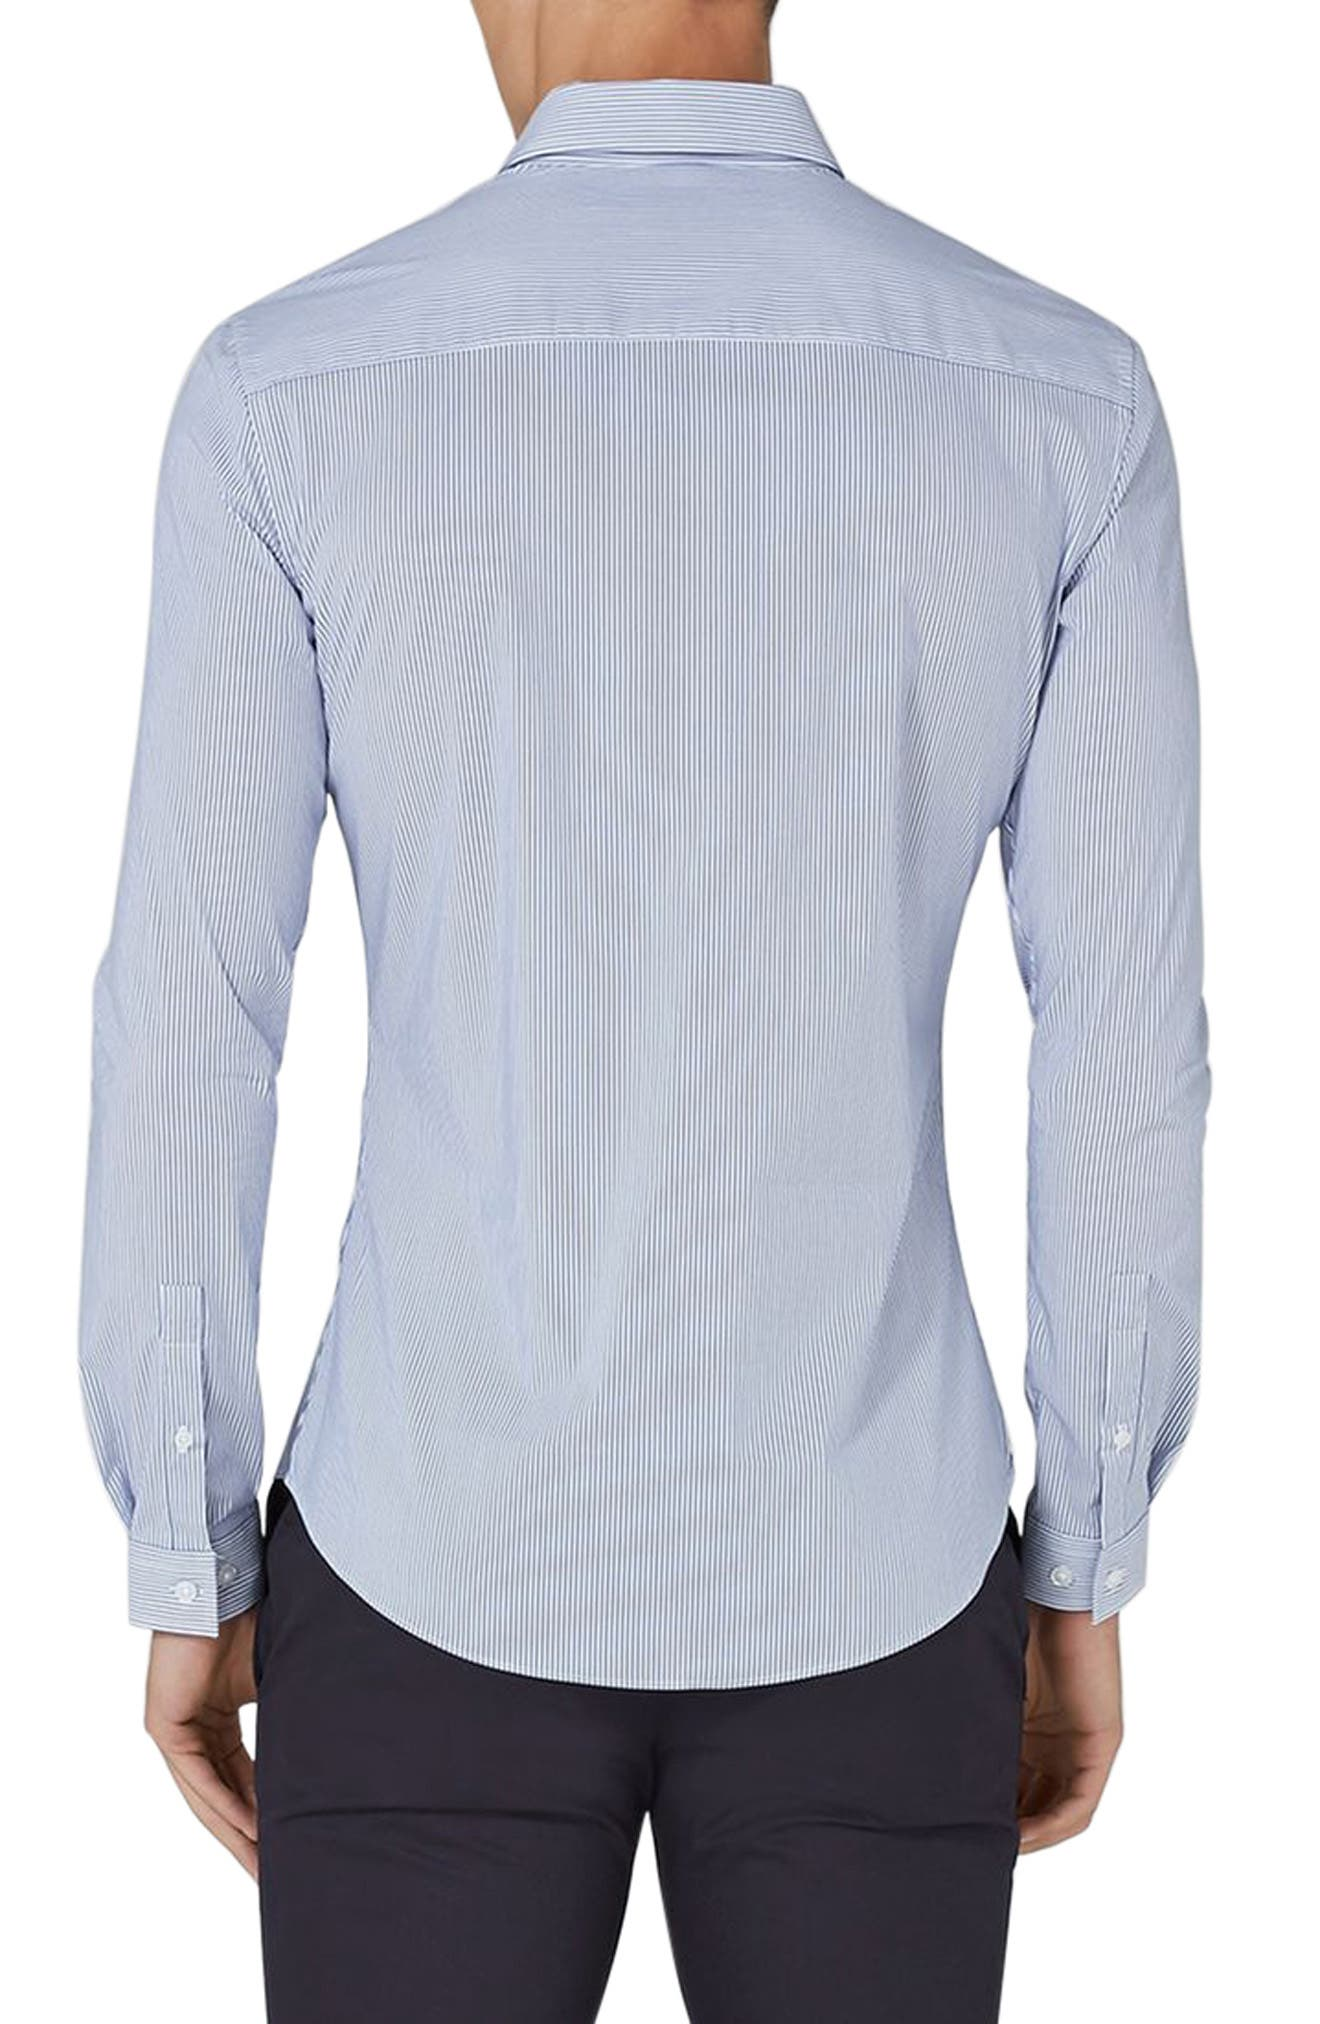 Muscle Fit Smart Shirt,                             Alternate thumbnail 3, color,                             400